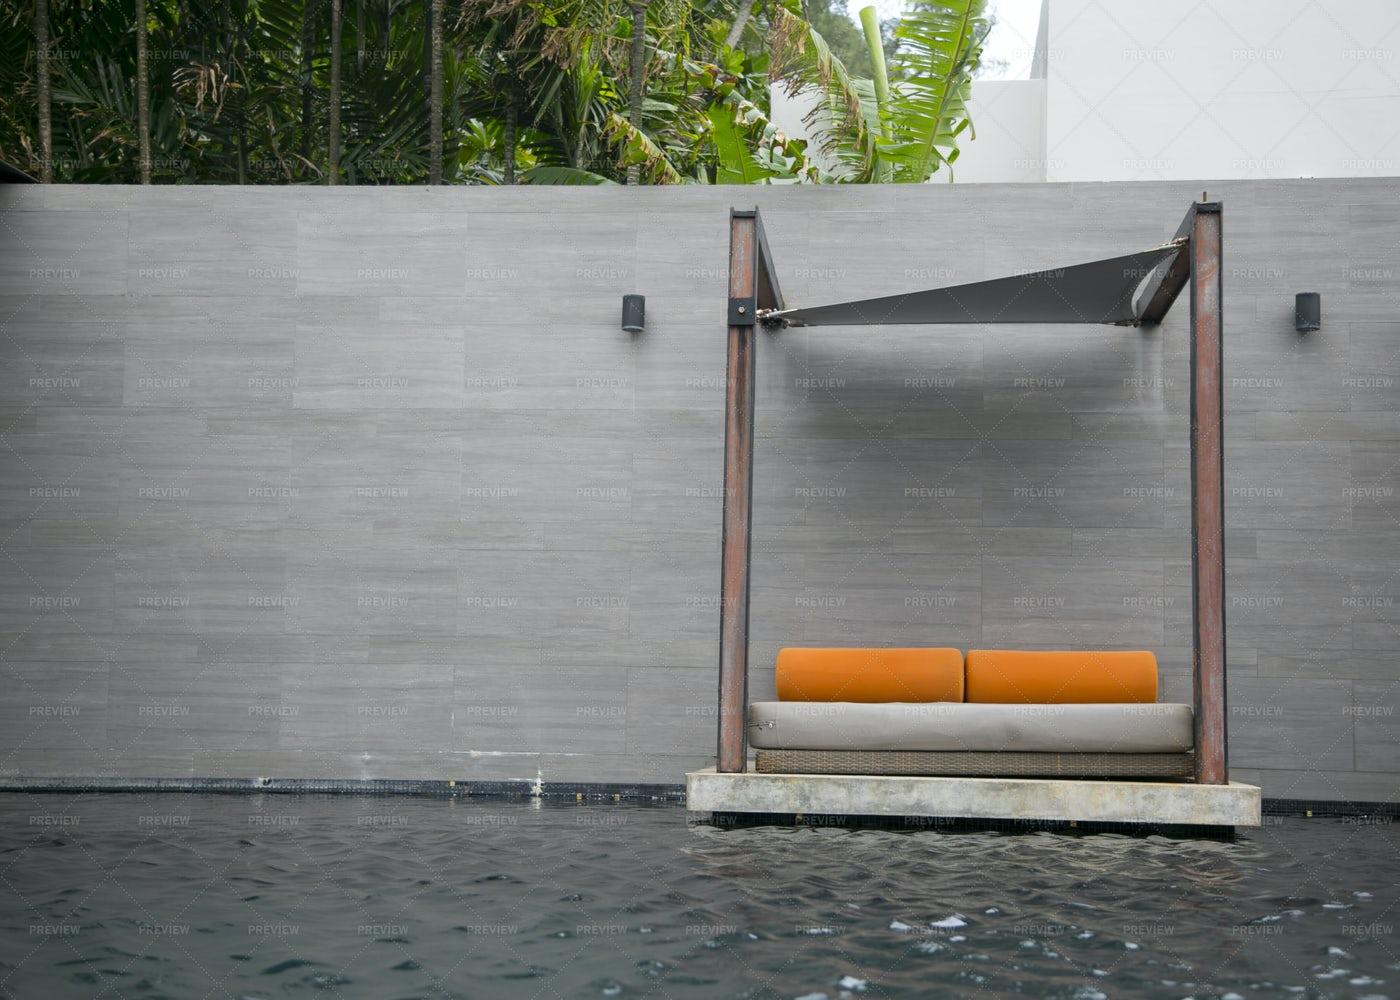 Swimming Pool Furniture: Stock Photos